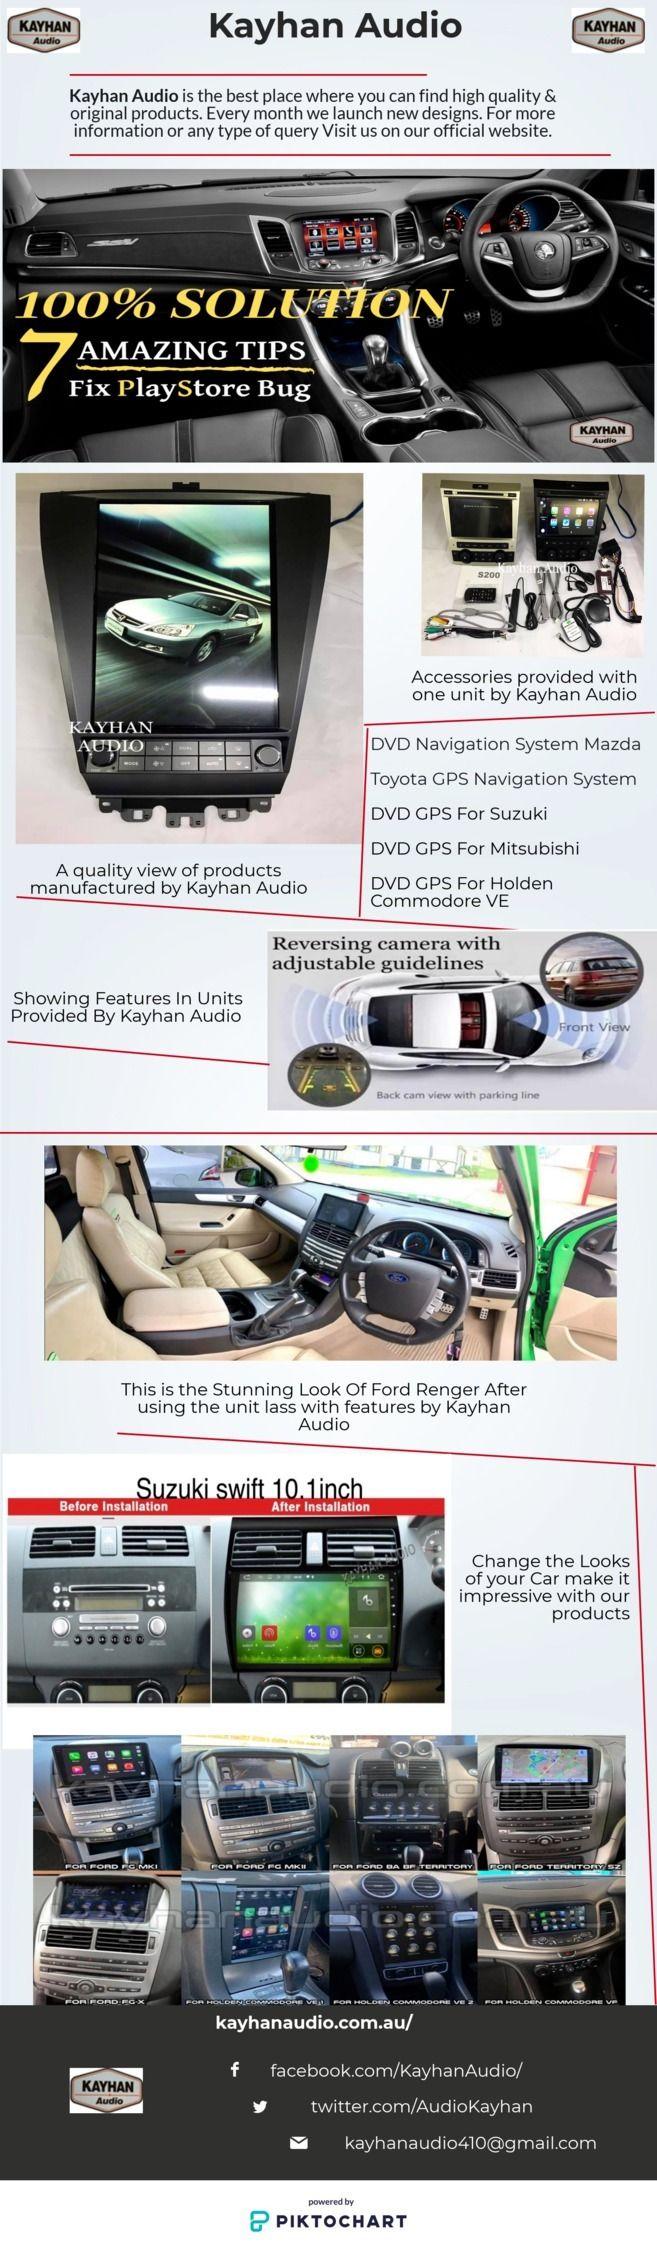 DVD Navigation System Mazda Kay - kayhanaudio | ello